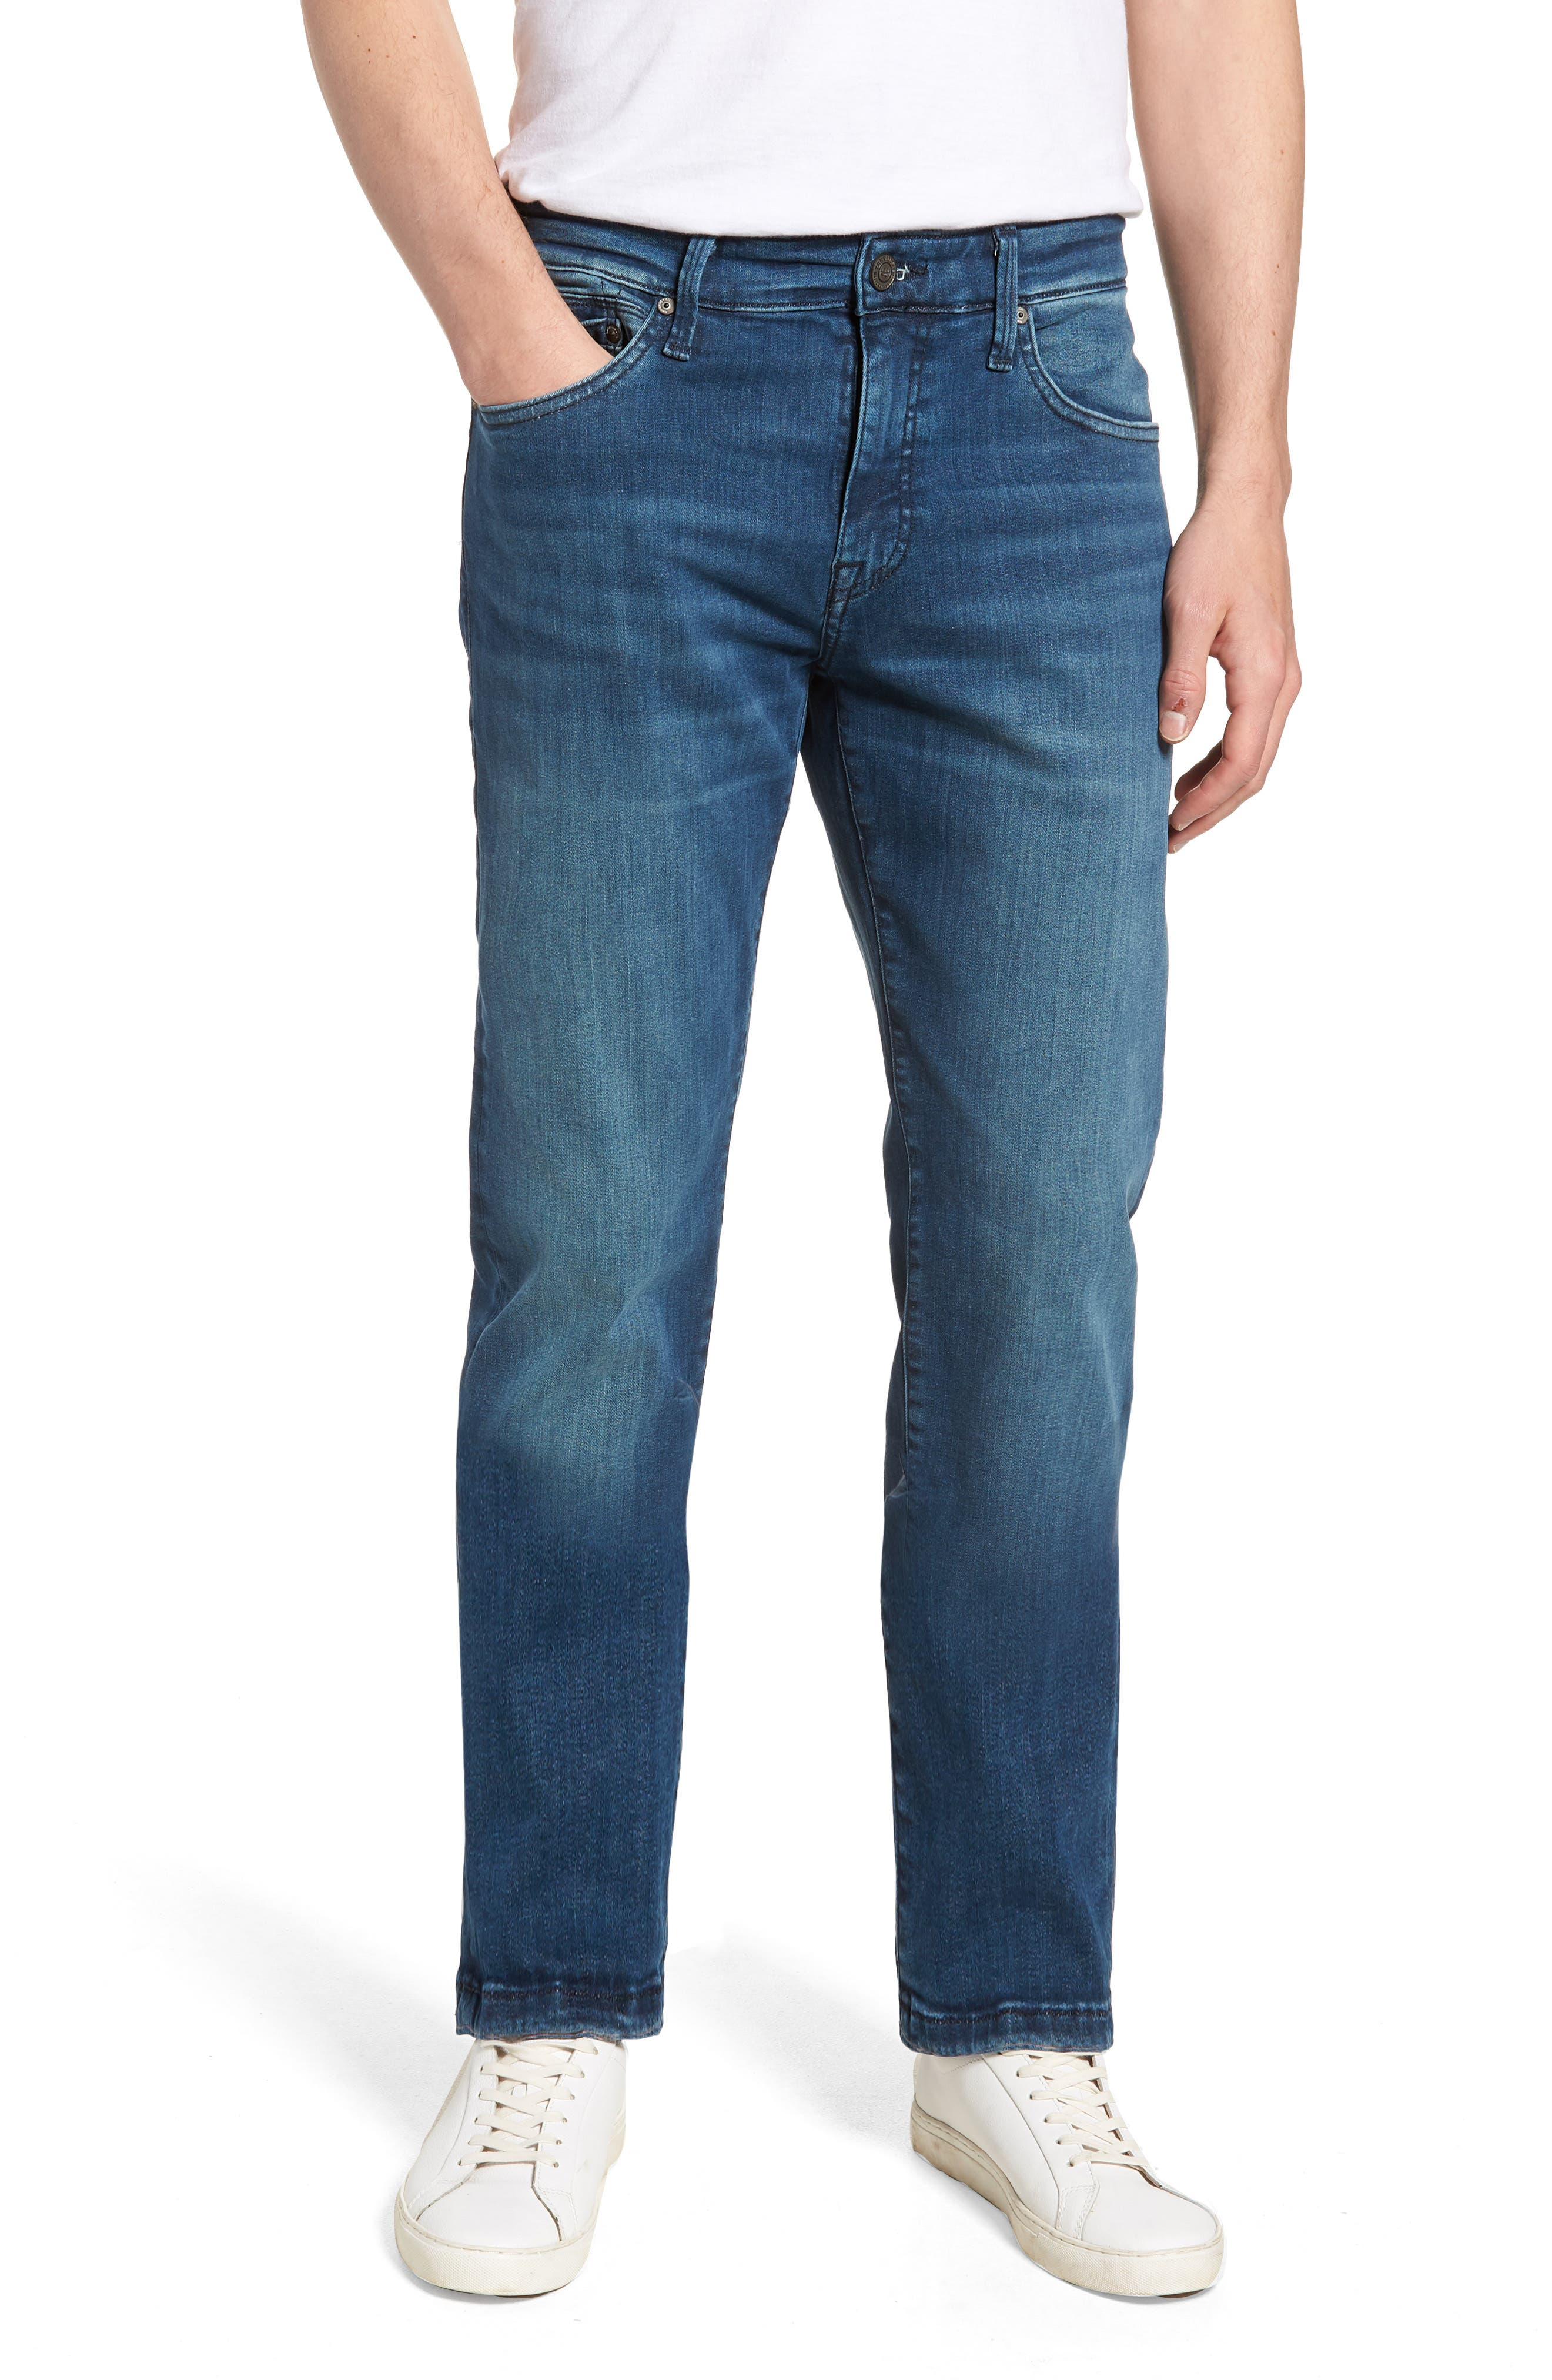 MAVI JEANS Marcus Slim Straight Leg Jeans in Mid Tonal Williamsburg